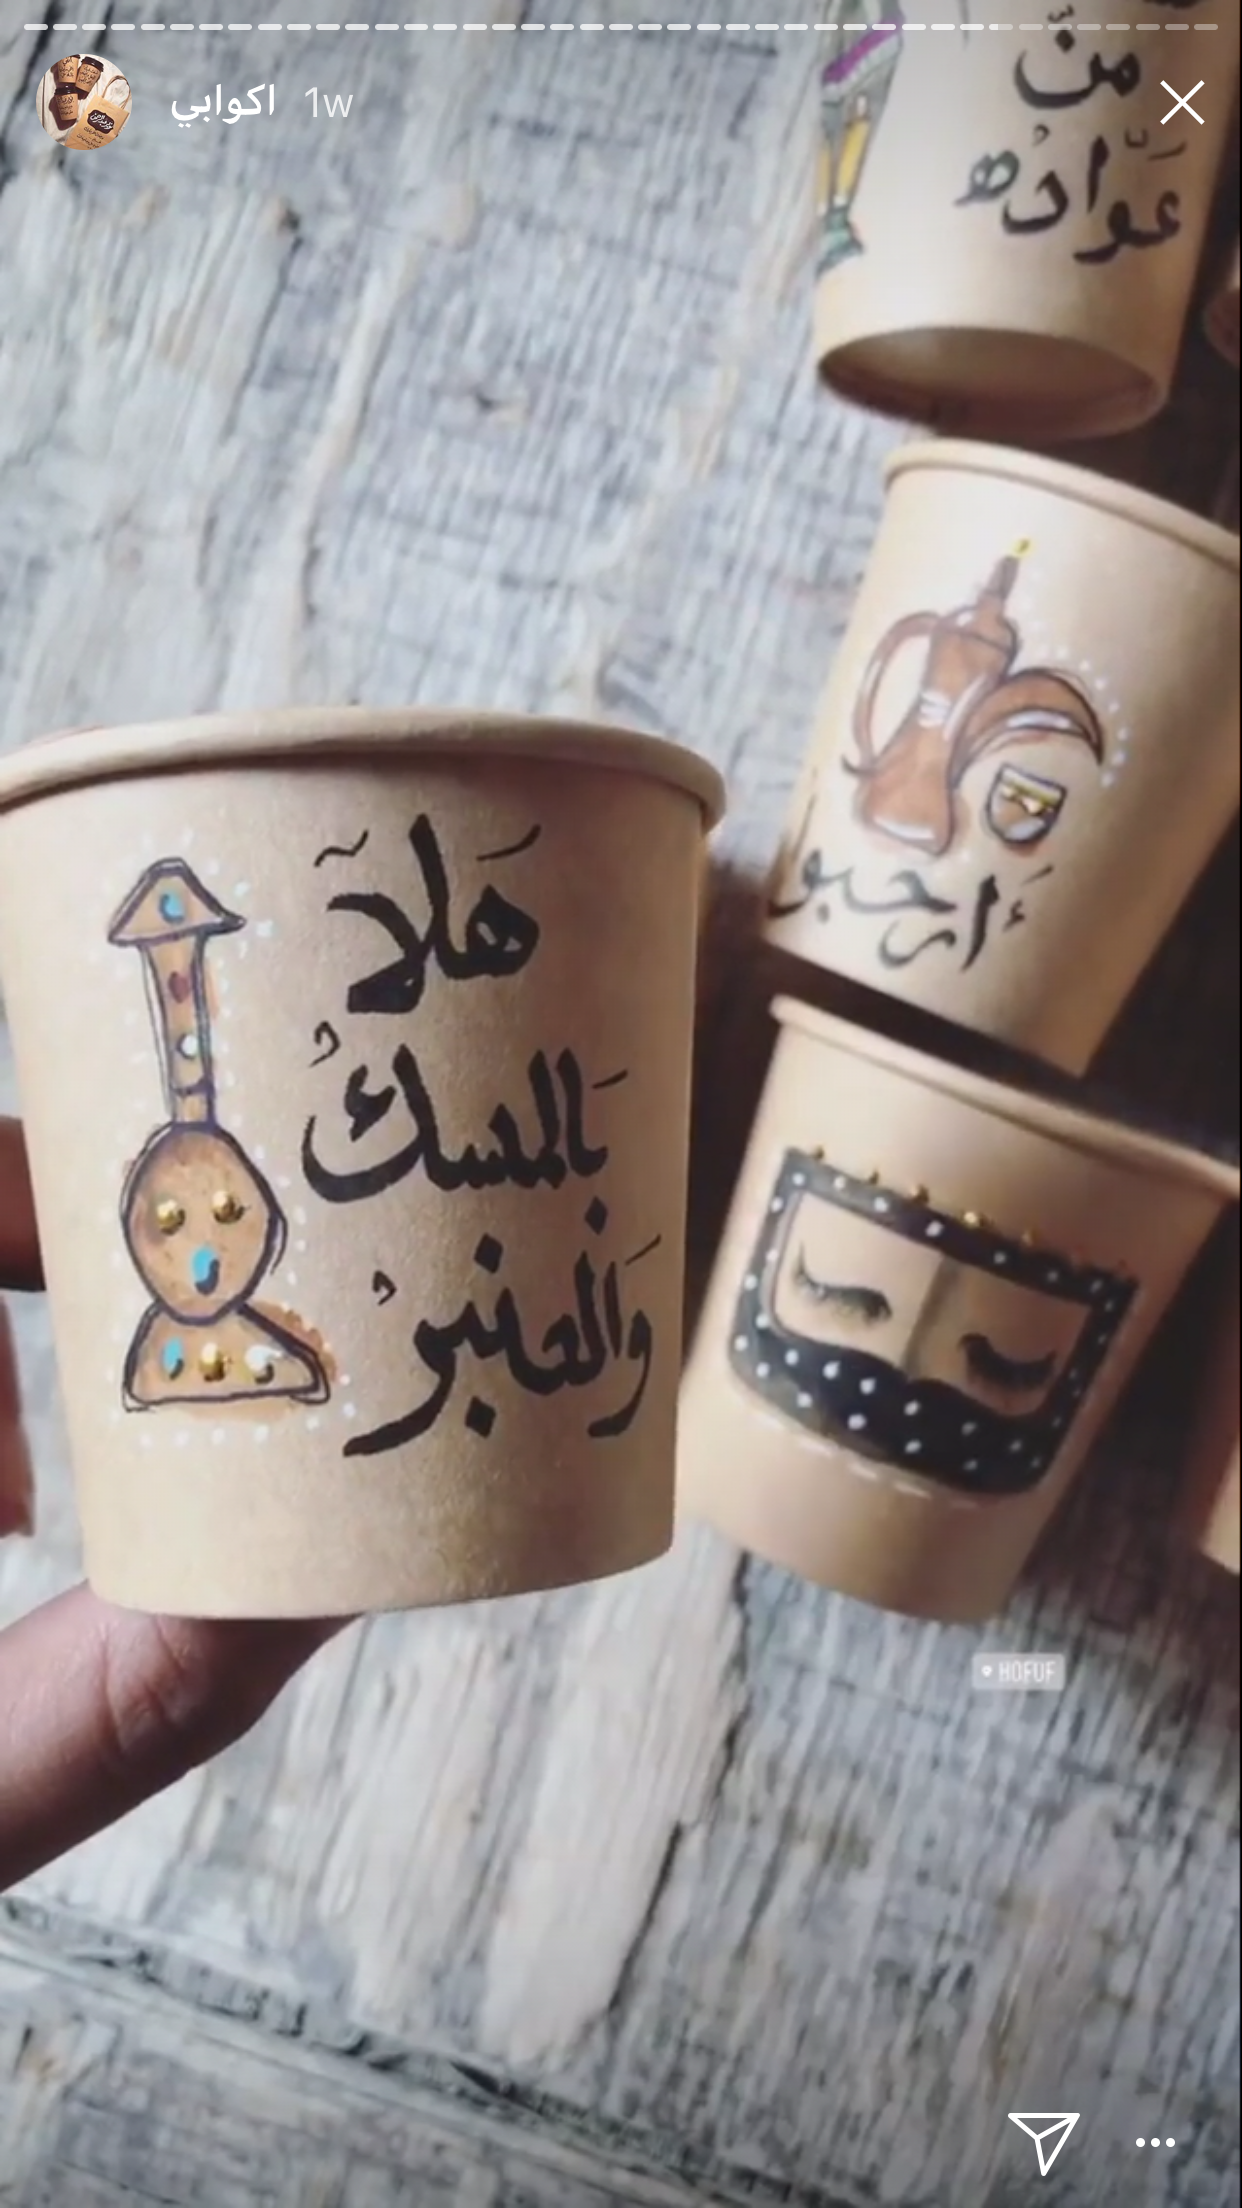 Pin By Kim Joon On توزيعات وهدايا Coffee Cup Art Ramadan Crafts Cup Art